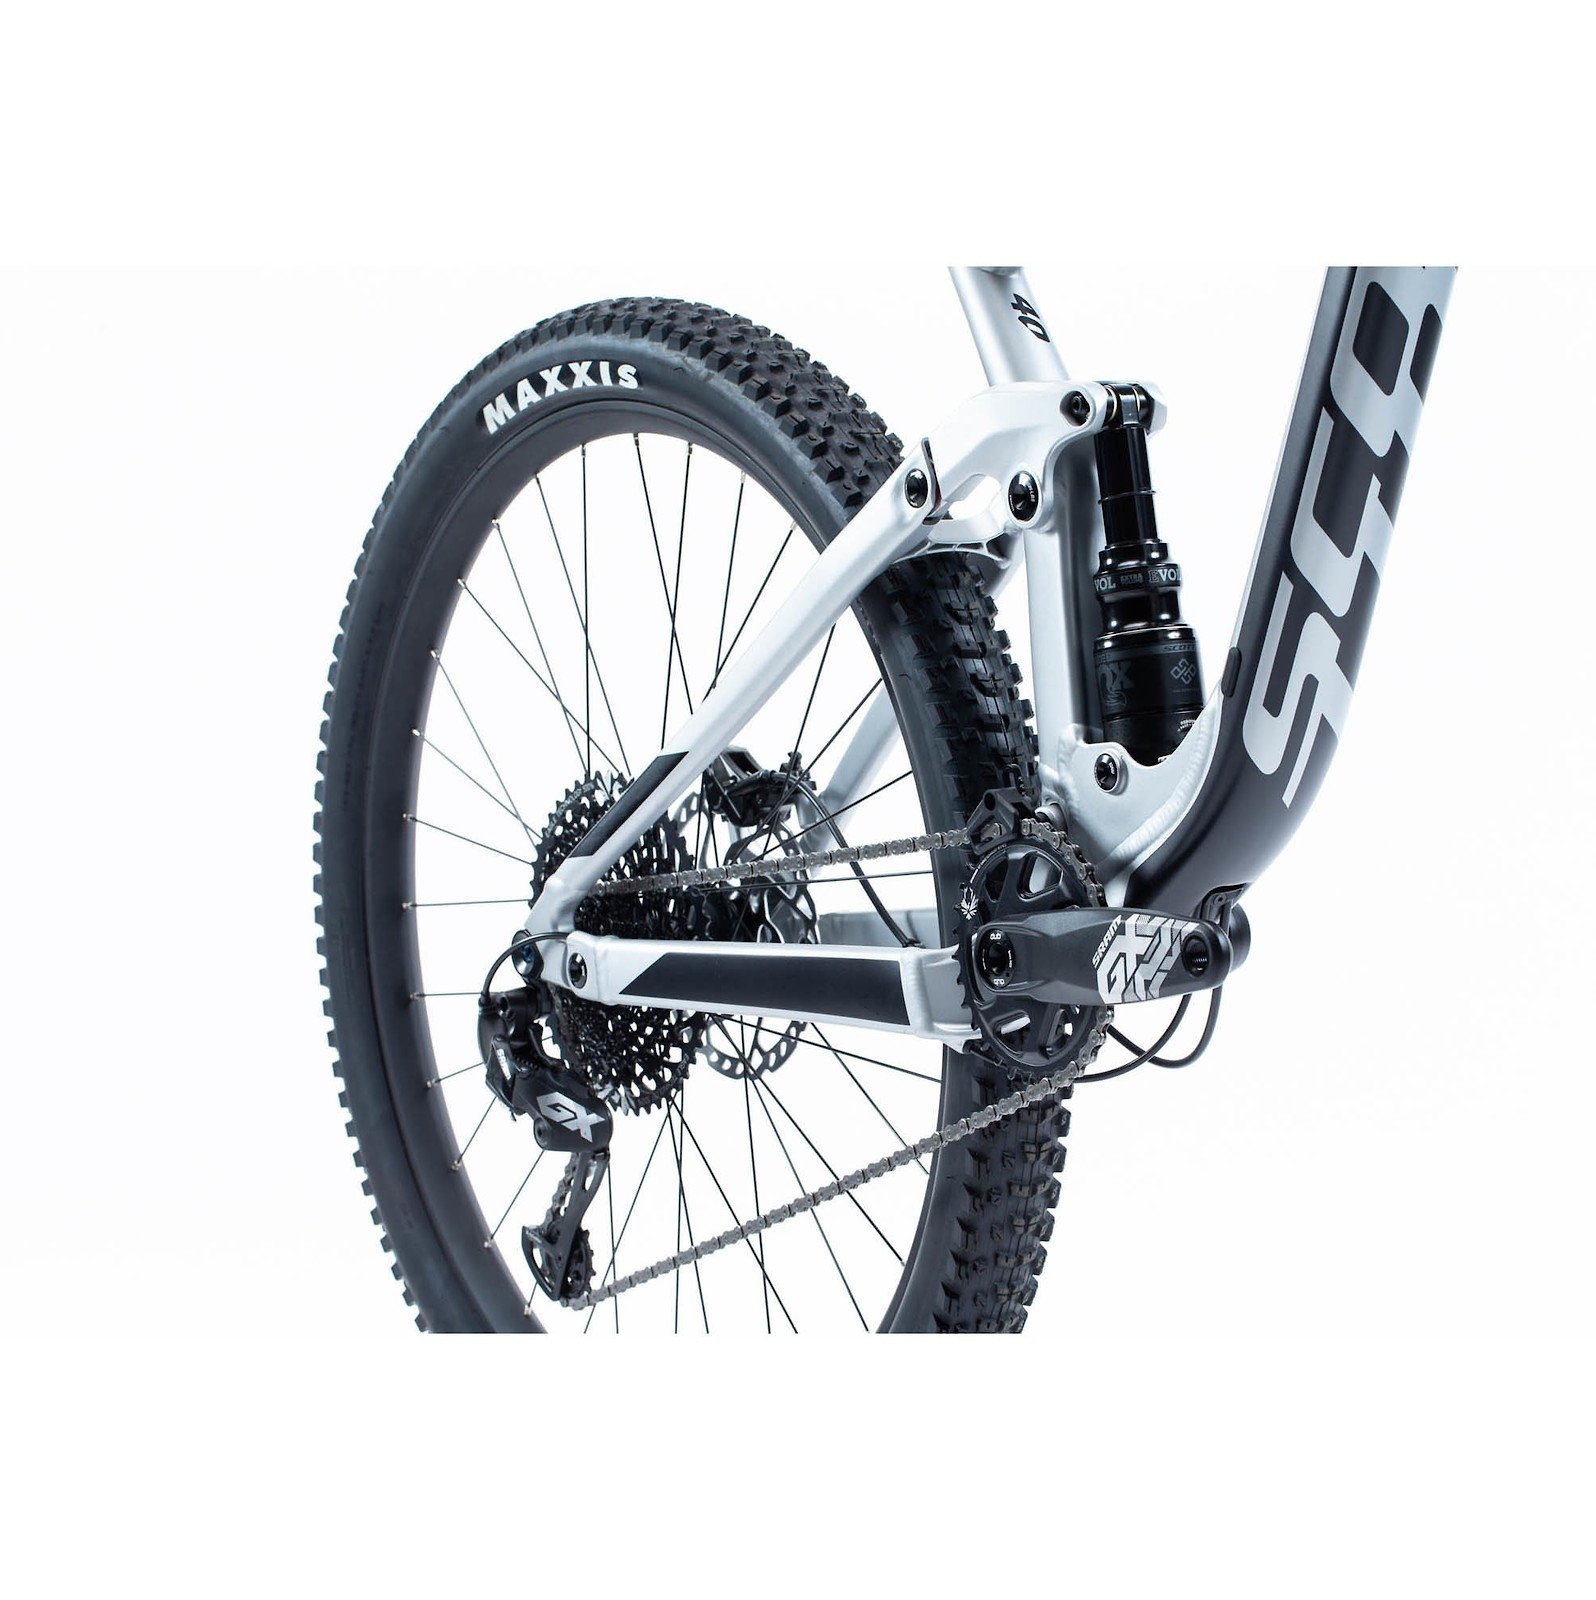 b07dd317b39 2019 Scott Genius 940 Bike - Reviews, Comparisons, Specs - Mountain ...